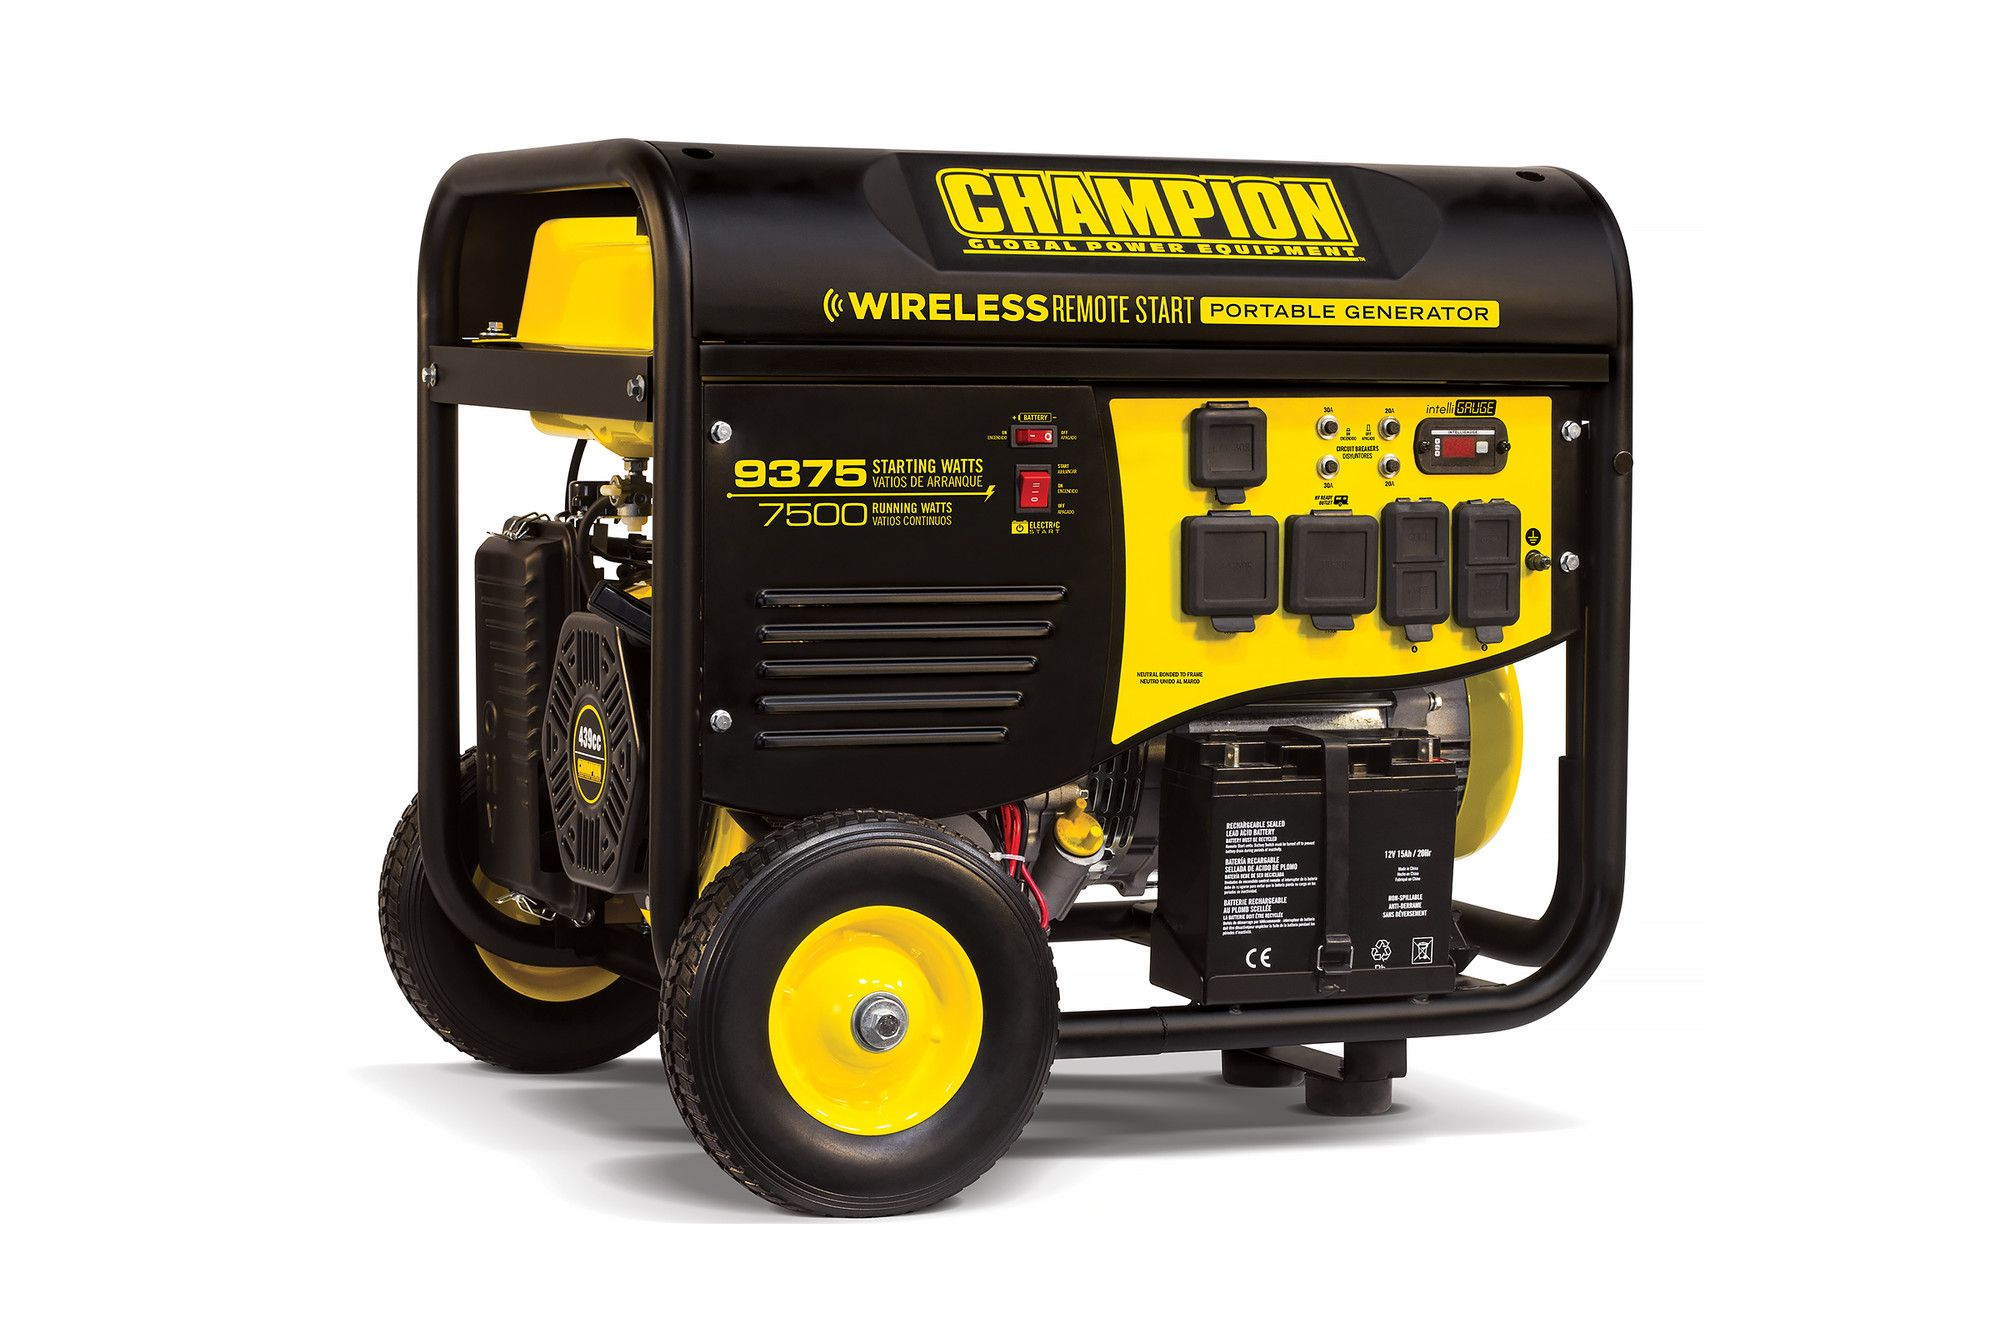 9375 Watt Portable Gasoline Generator with Wireless Remote